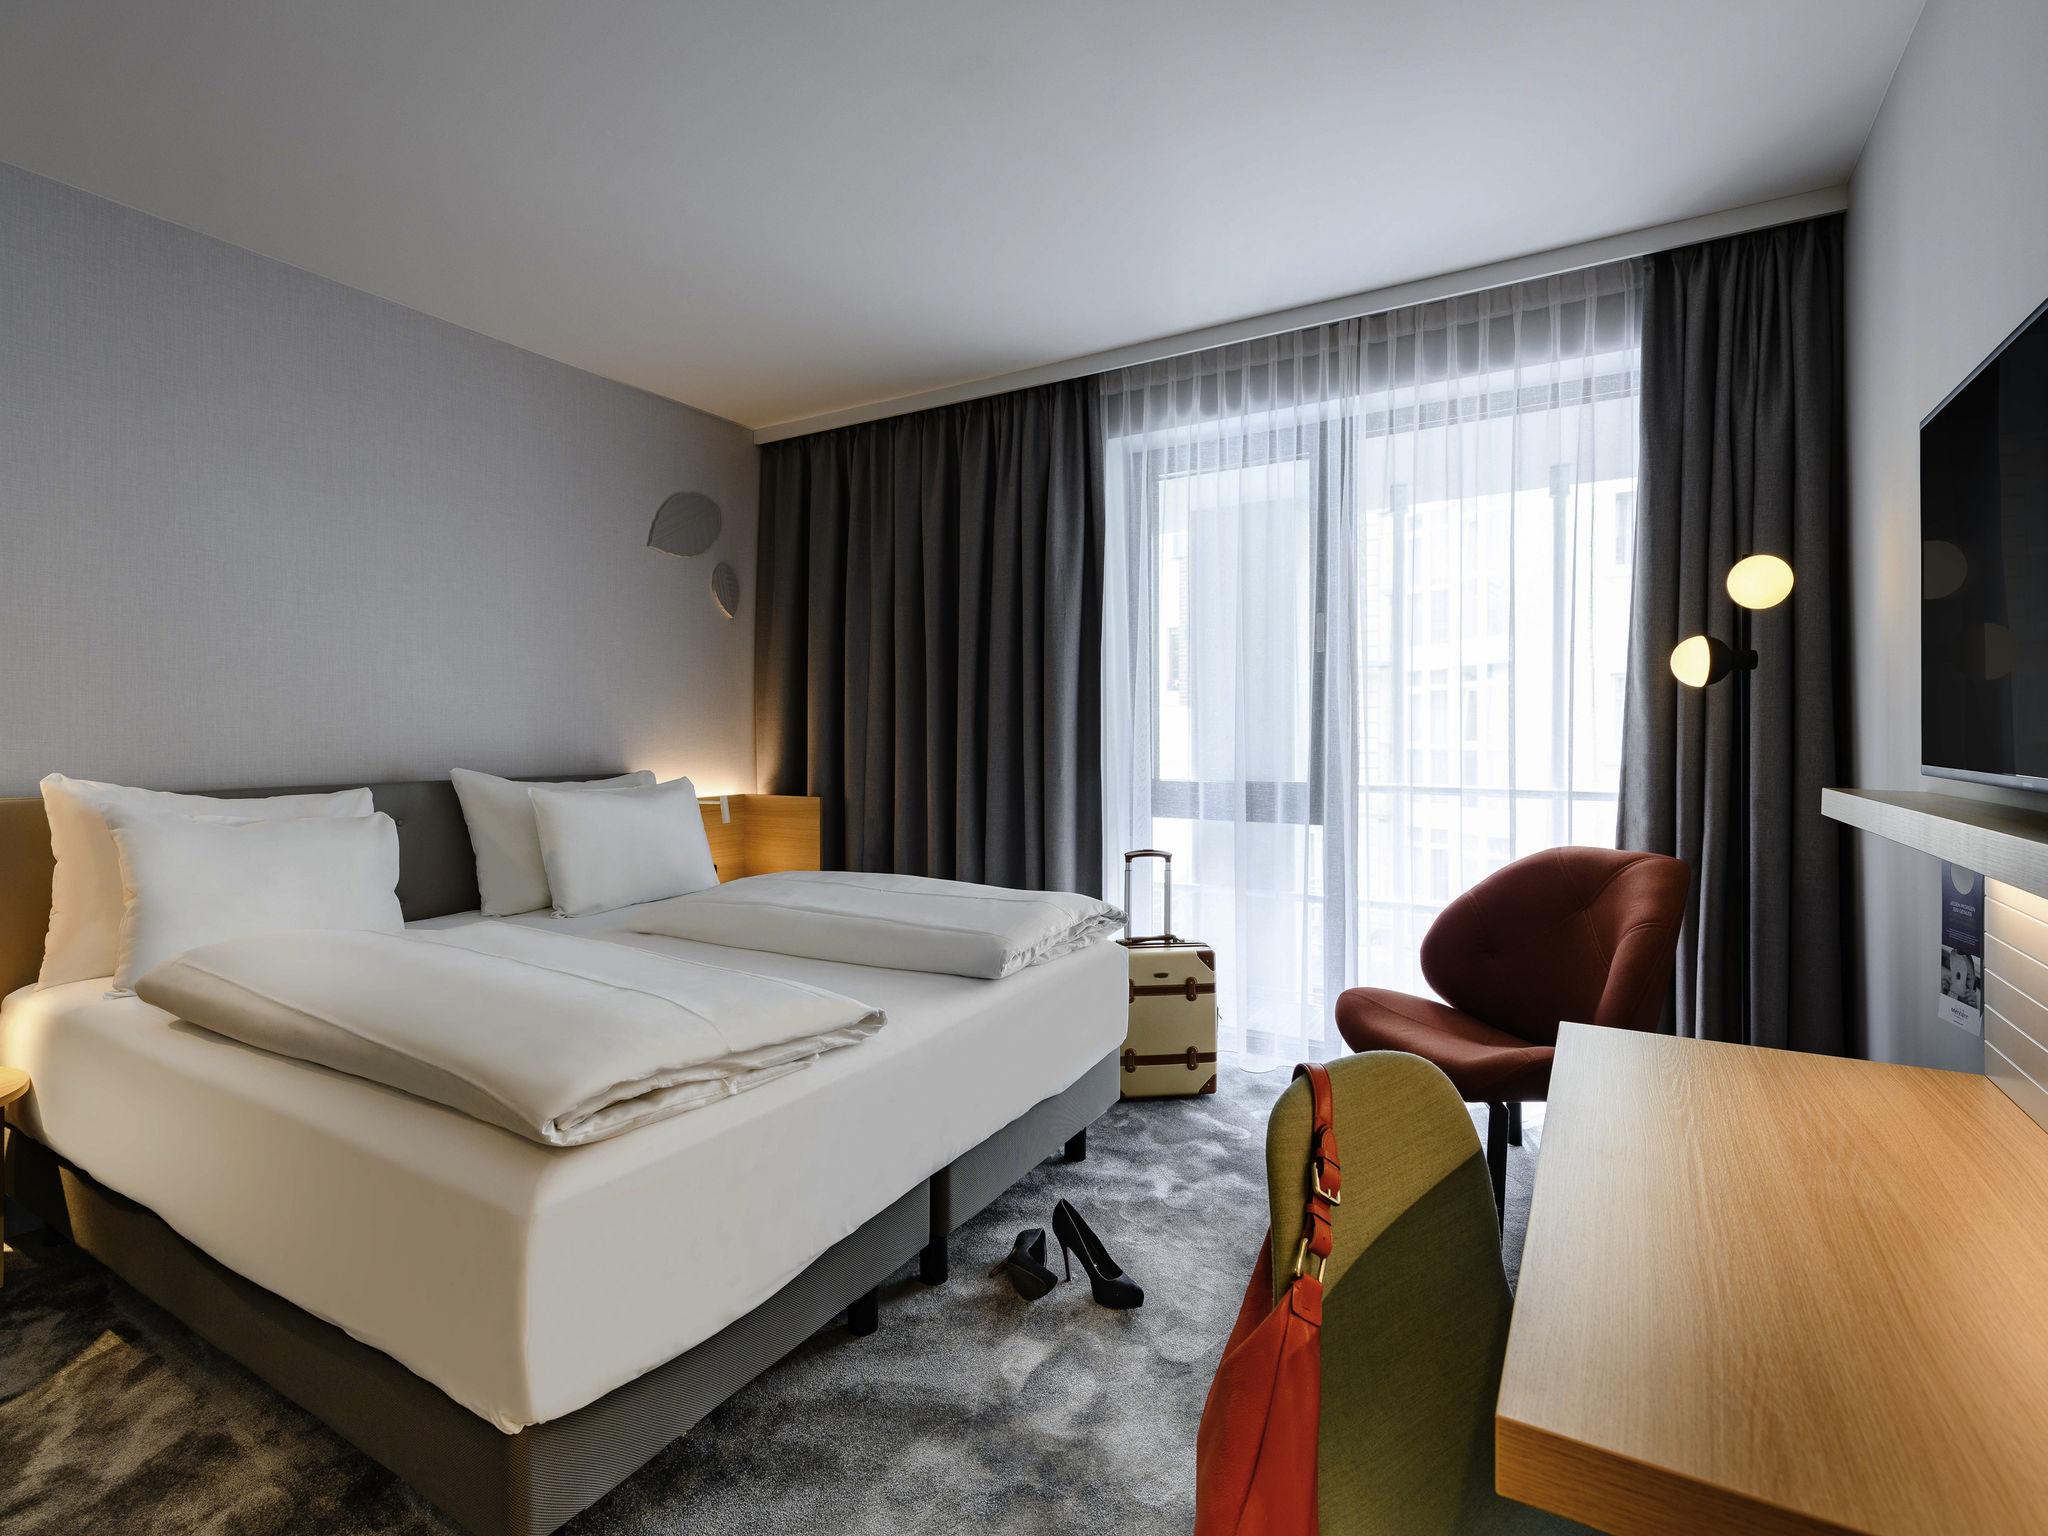 Hotel – Hotel Mercure Munique Schwabing